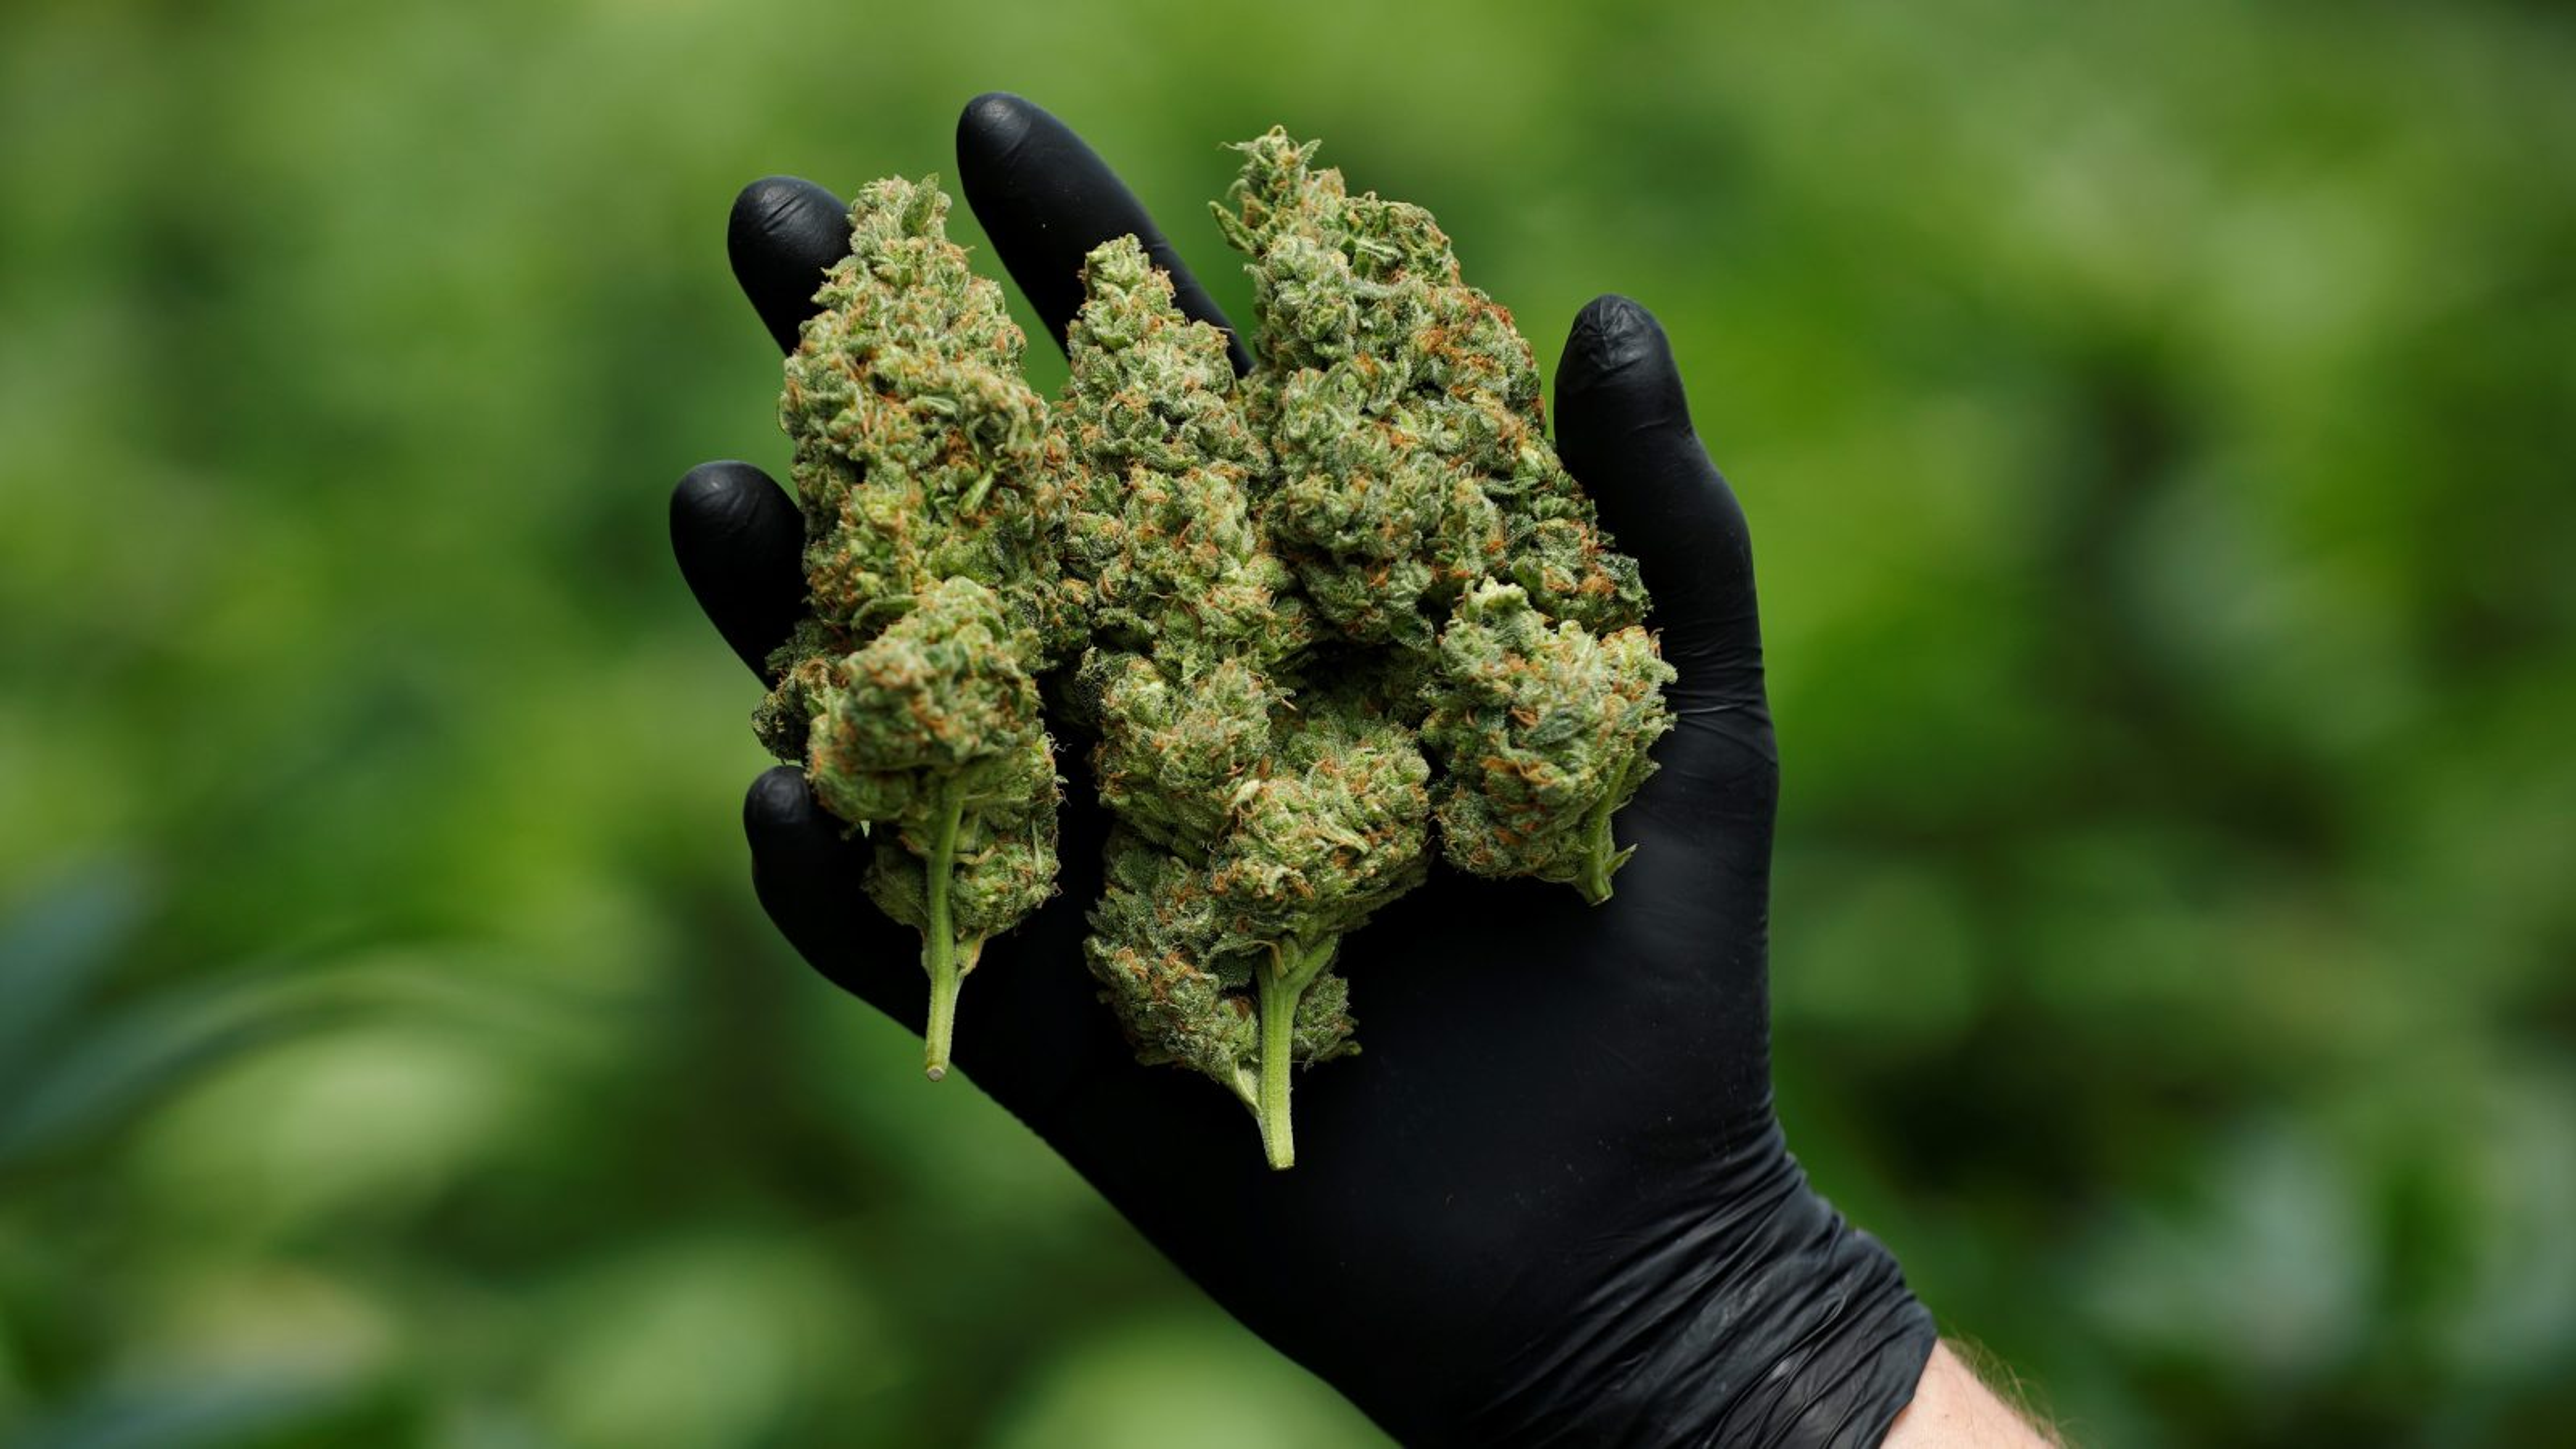 qz.com - Jenni Avins - Does the cannabis industry have a monopoly problem?